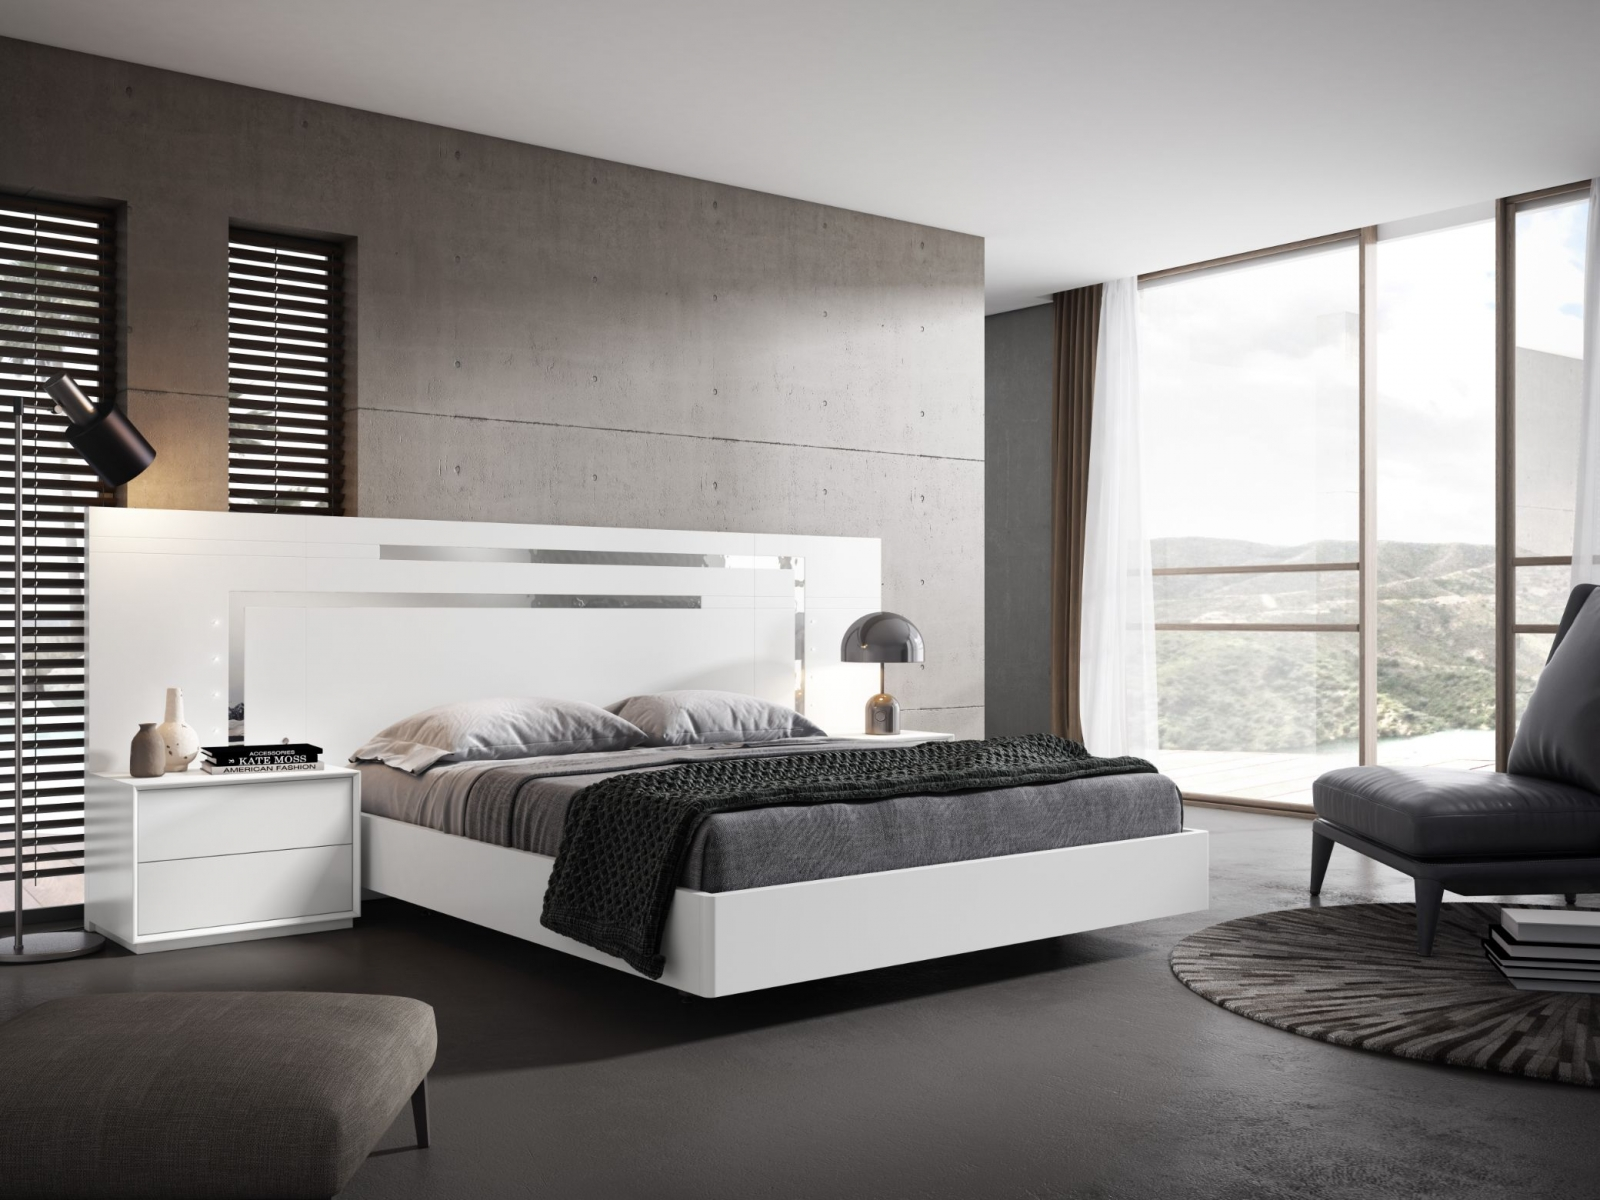 Conjunto de Dormitorio SUNSET-3 - Conjunto de Dormitorio SUNSET-3